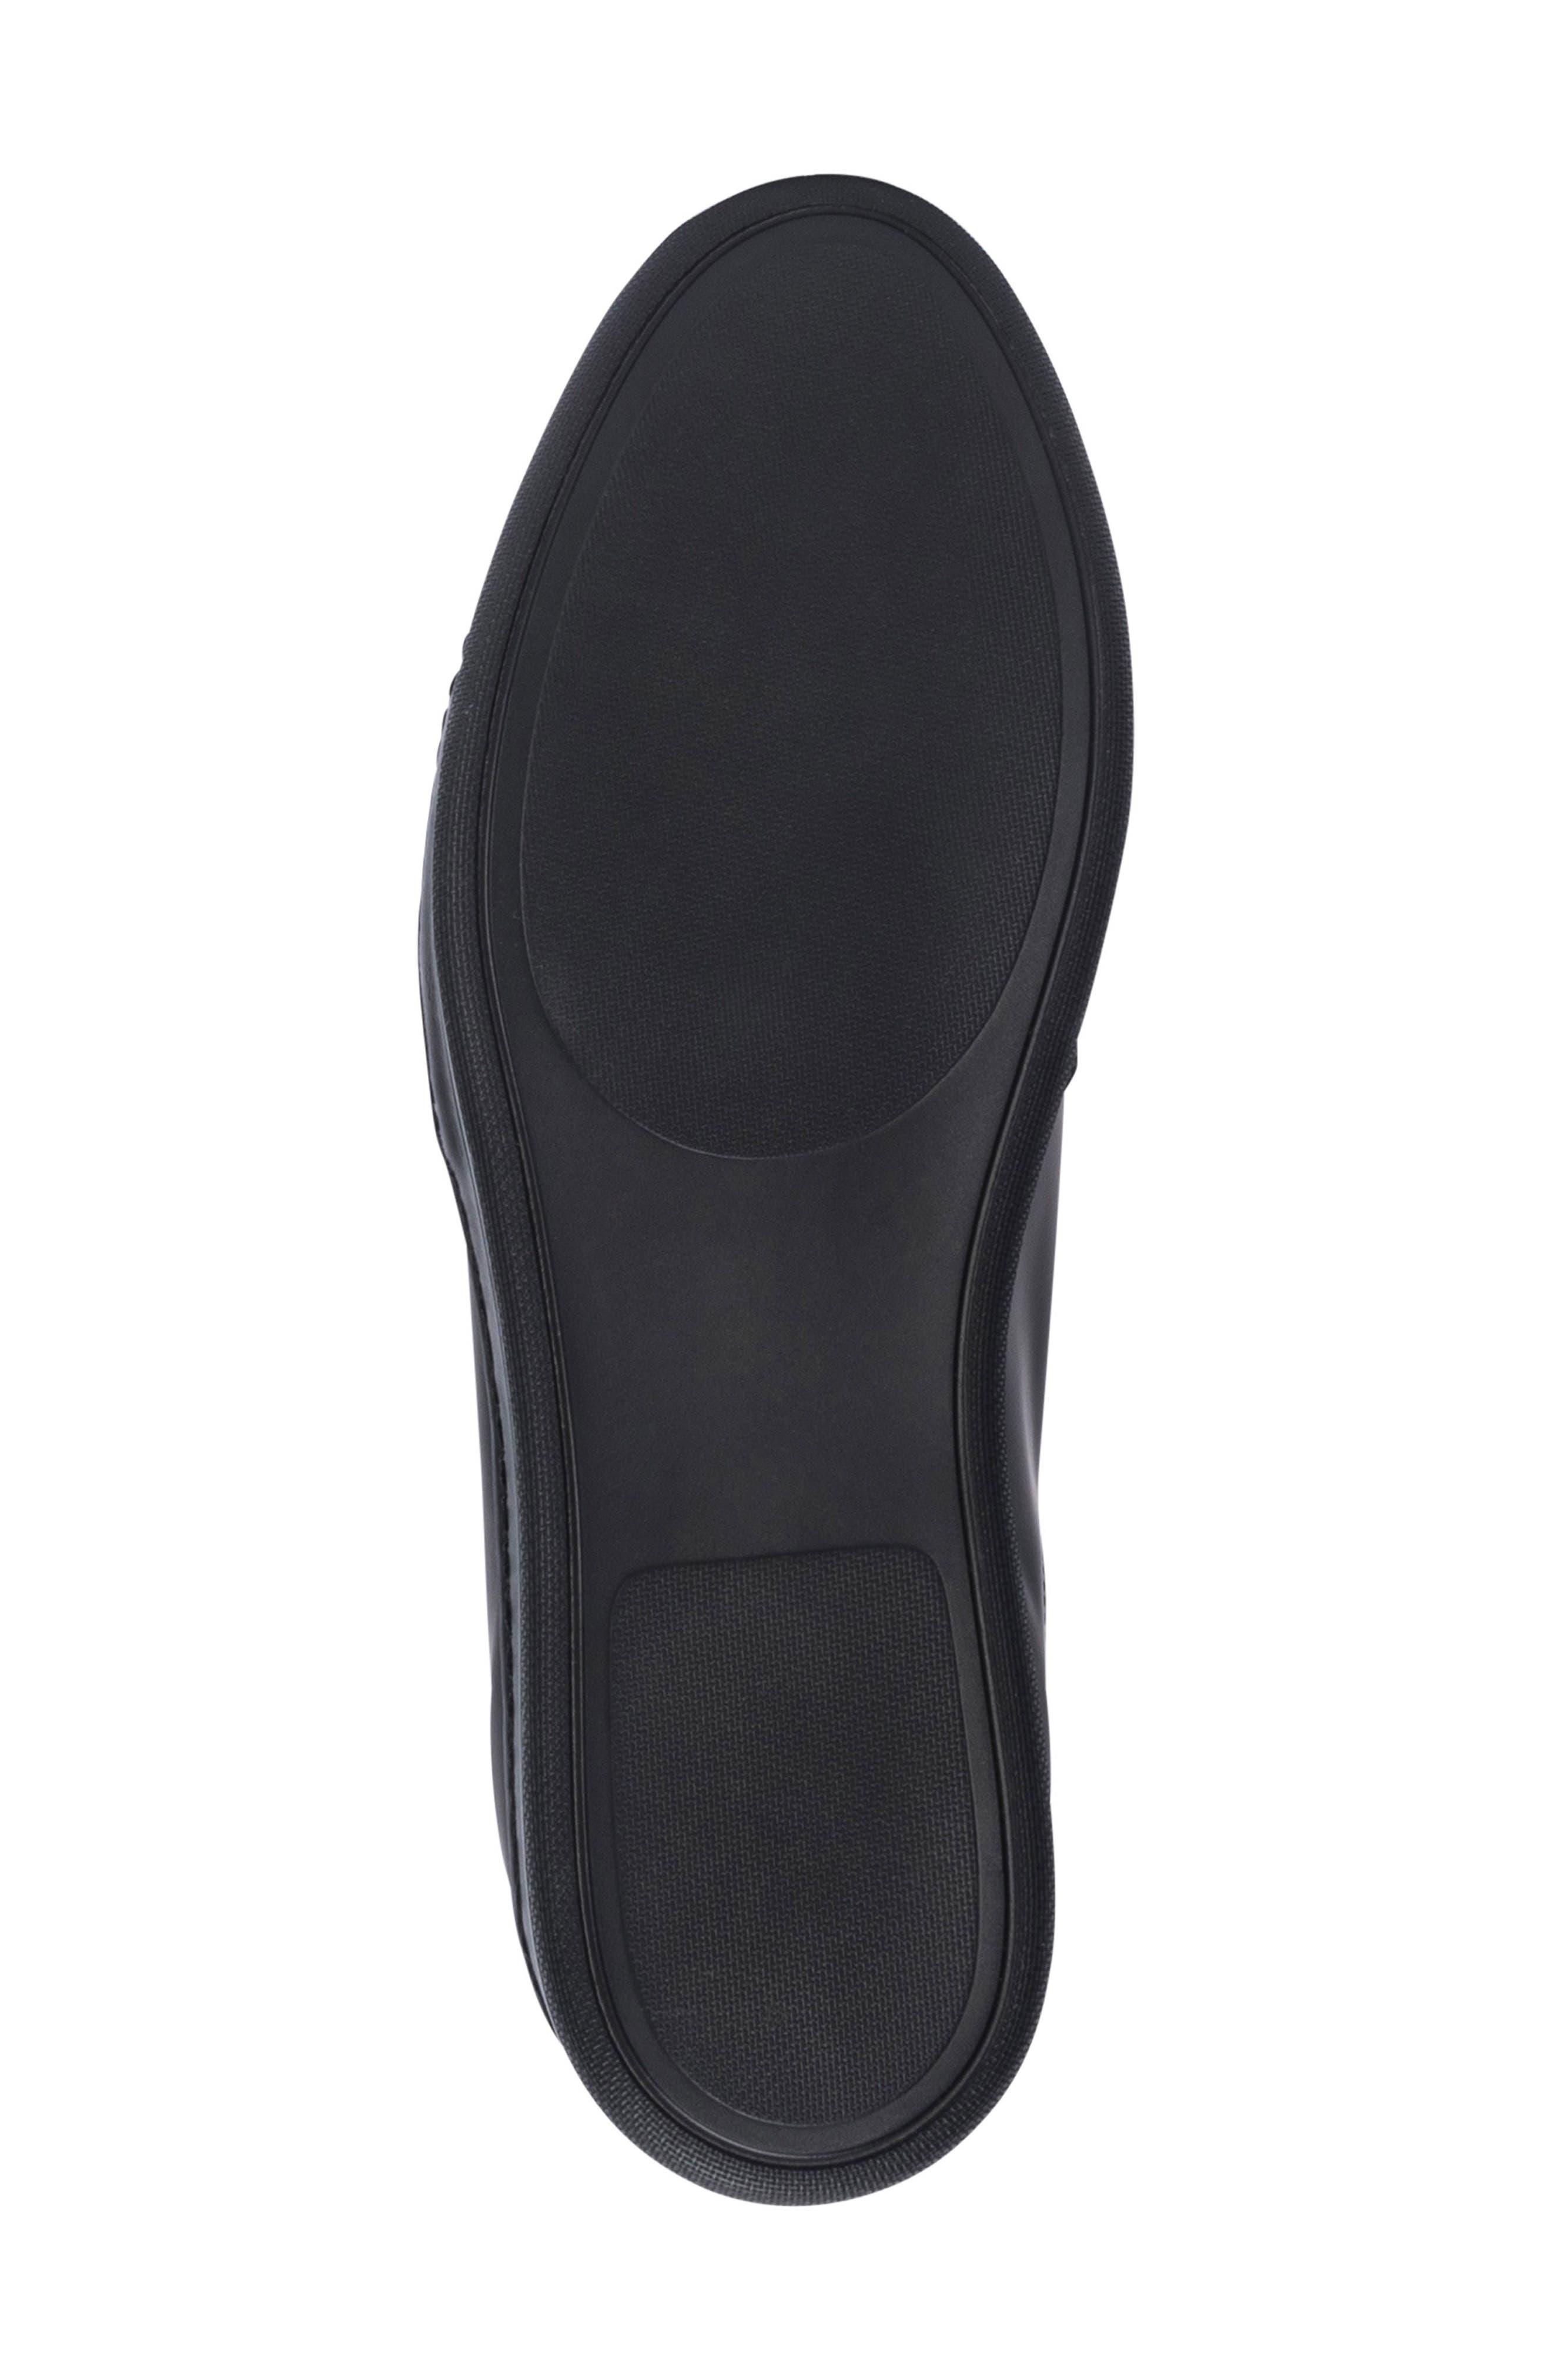 Bellagio Sneaker,                             Alternate thumbnail 6, color,                             Black